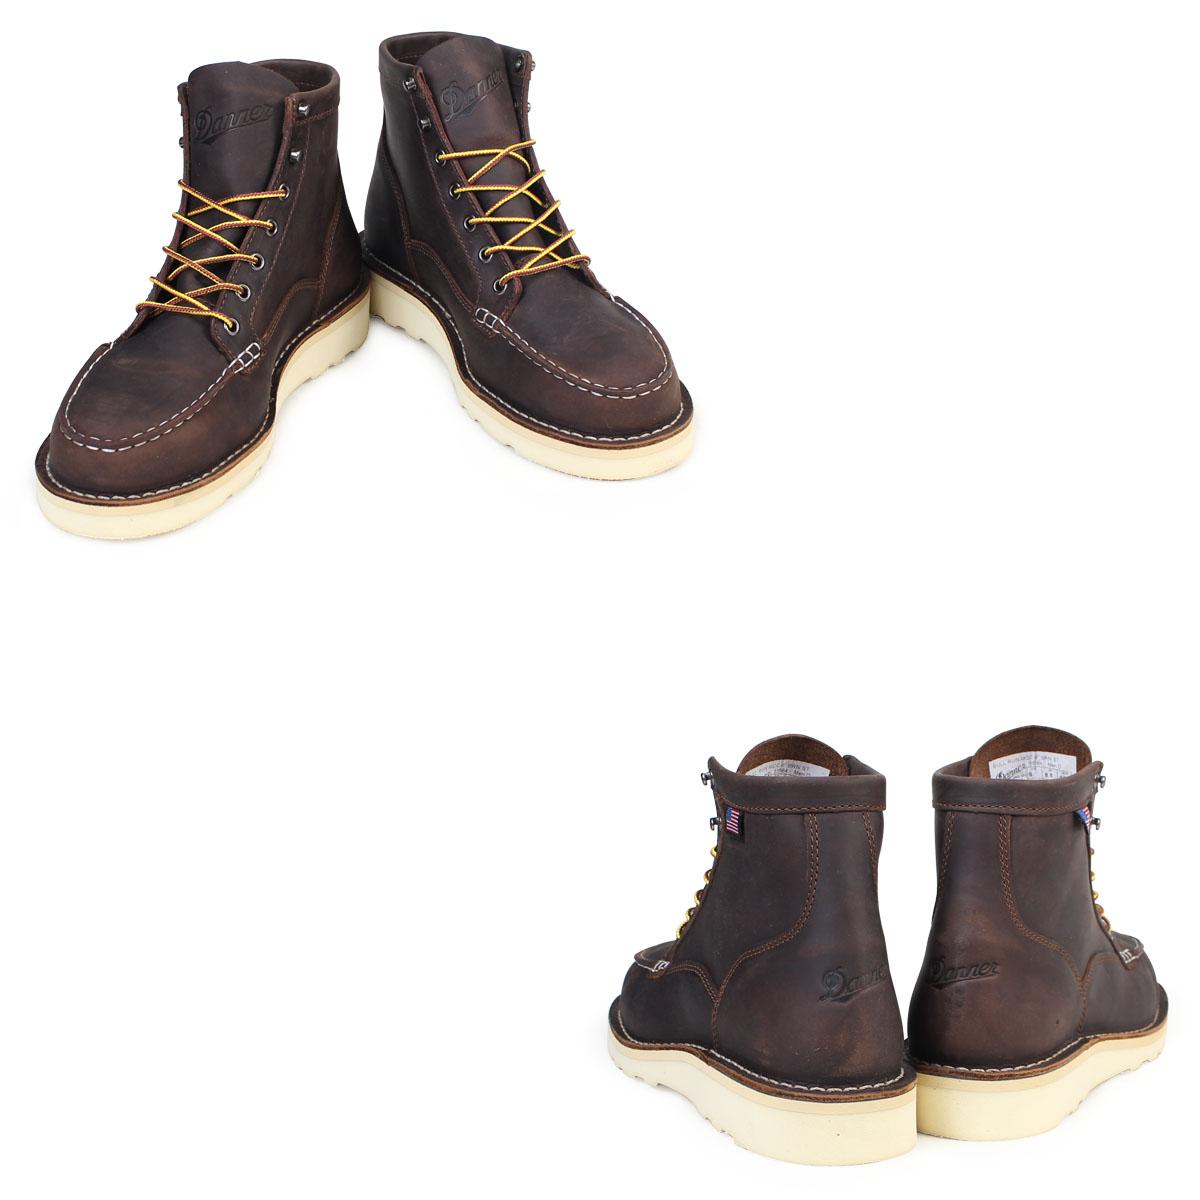 07965eac7662 SneaK Online Shop  Danner Danner boots BULL RUN MOC TOE 6INCH 15564 ...